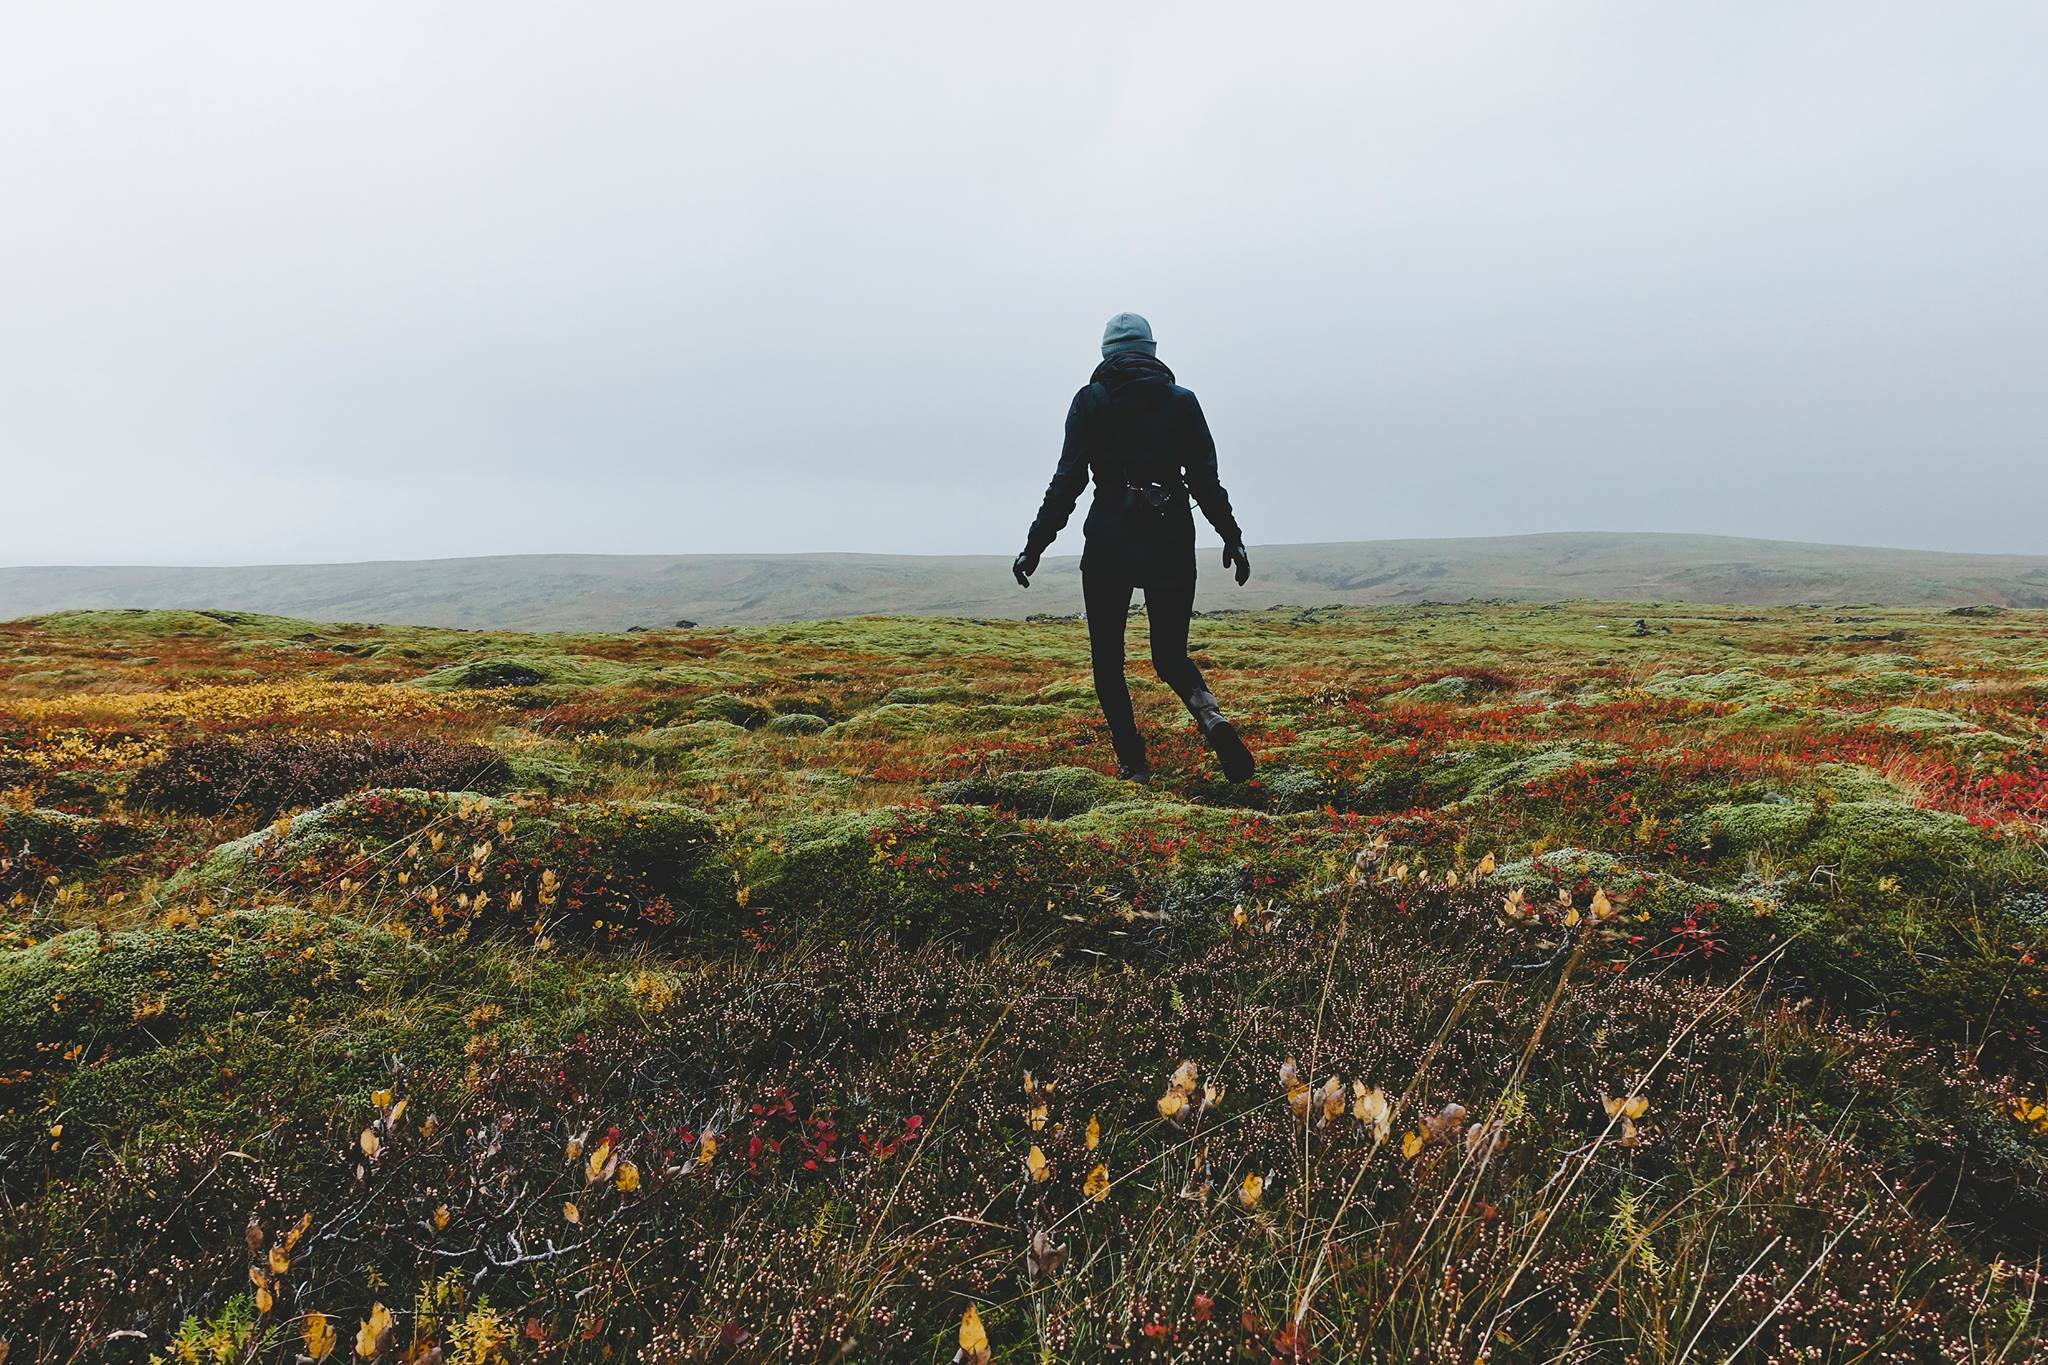 Just traipsing around Iceland.